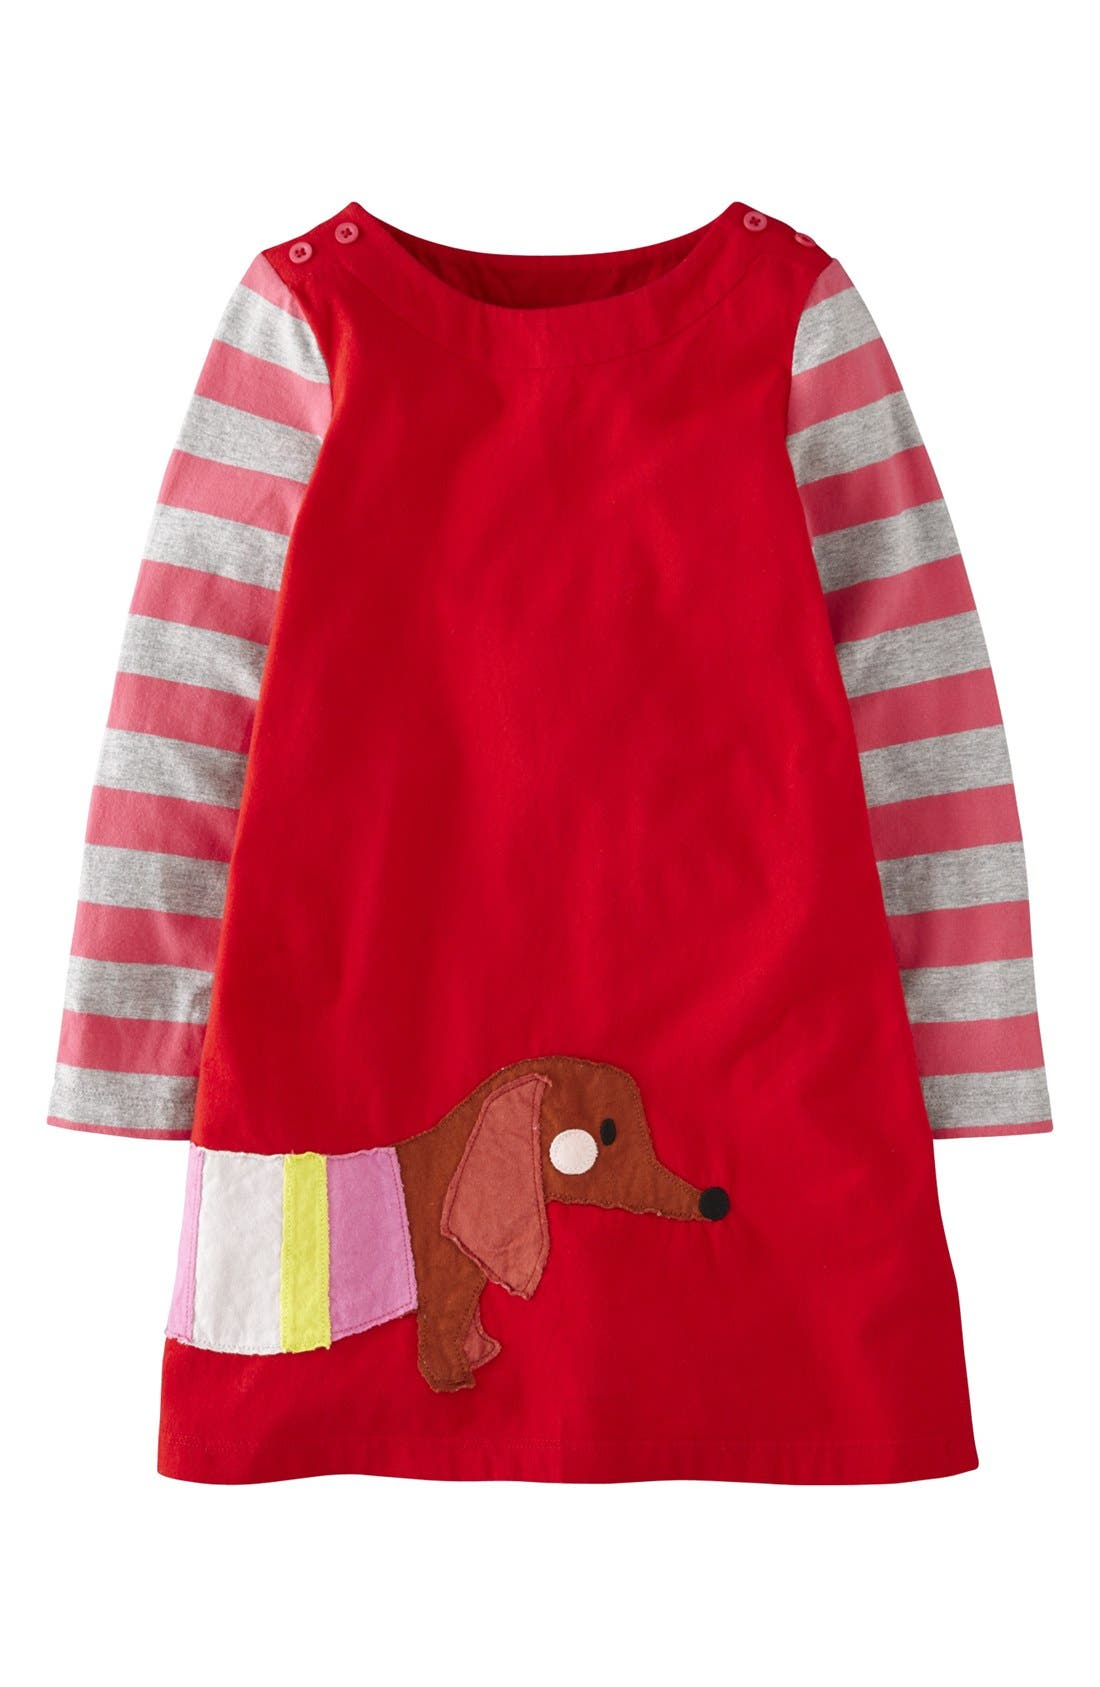 Alternate Image 1 Selected - Mini Boden 'Fun' Appliqué Dress (Toddler Girls, Little Girls & Big Girls)